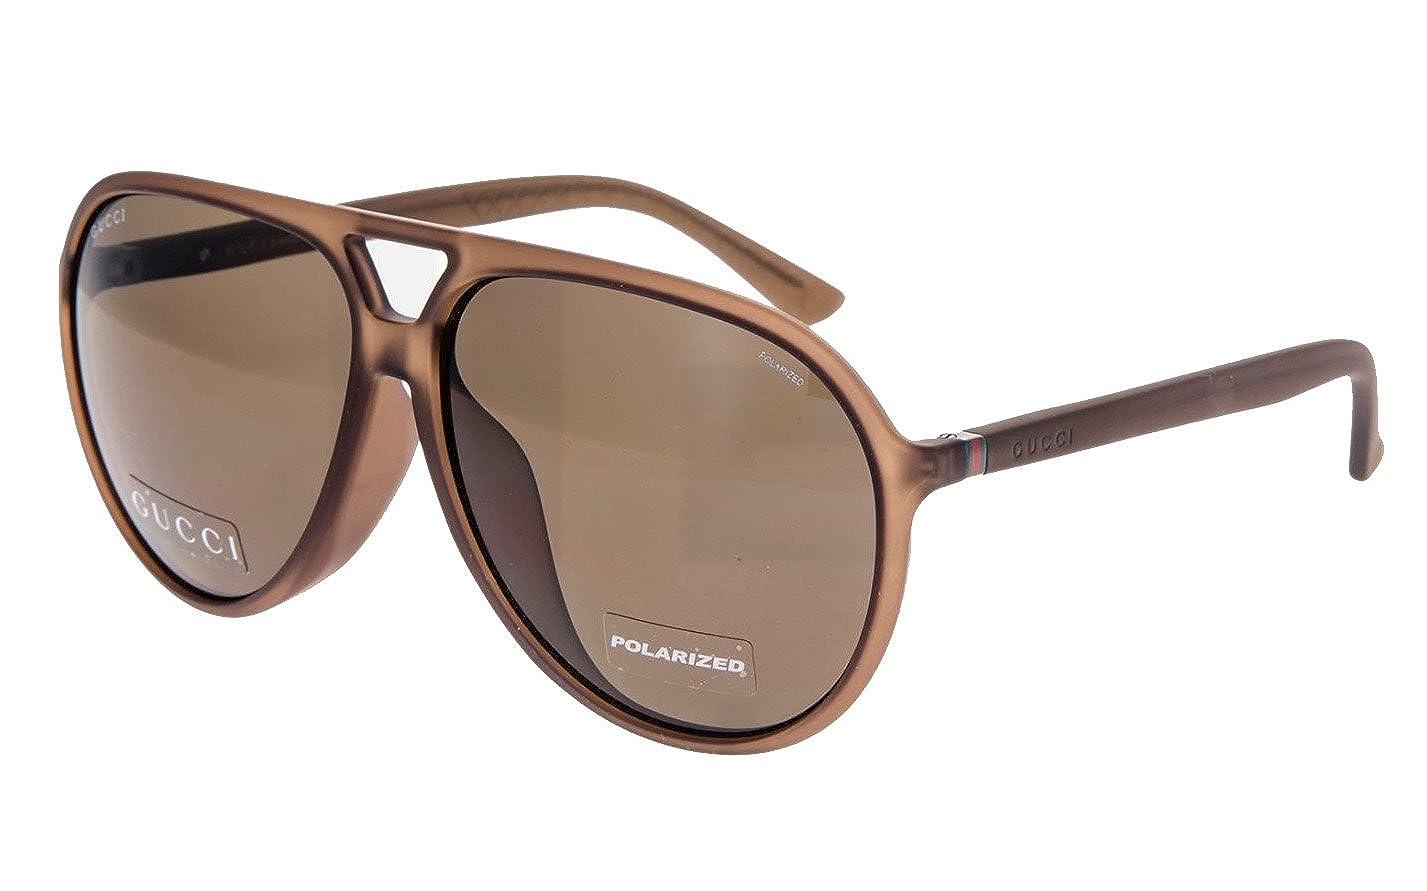 d3da6c49dd9b Amazon.com: GUCCI Aviator Brown Translucent POLARIZED Sport Sunglasses  1090: Clothing